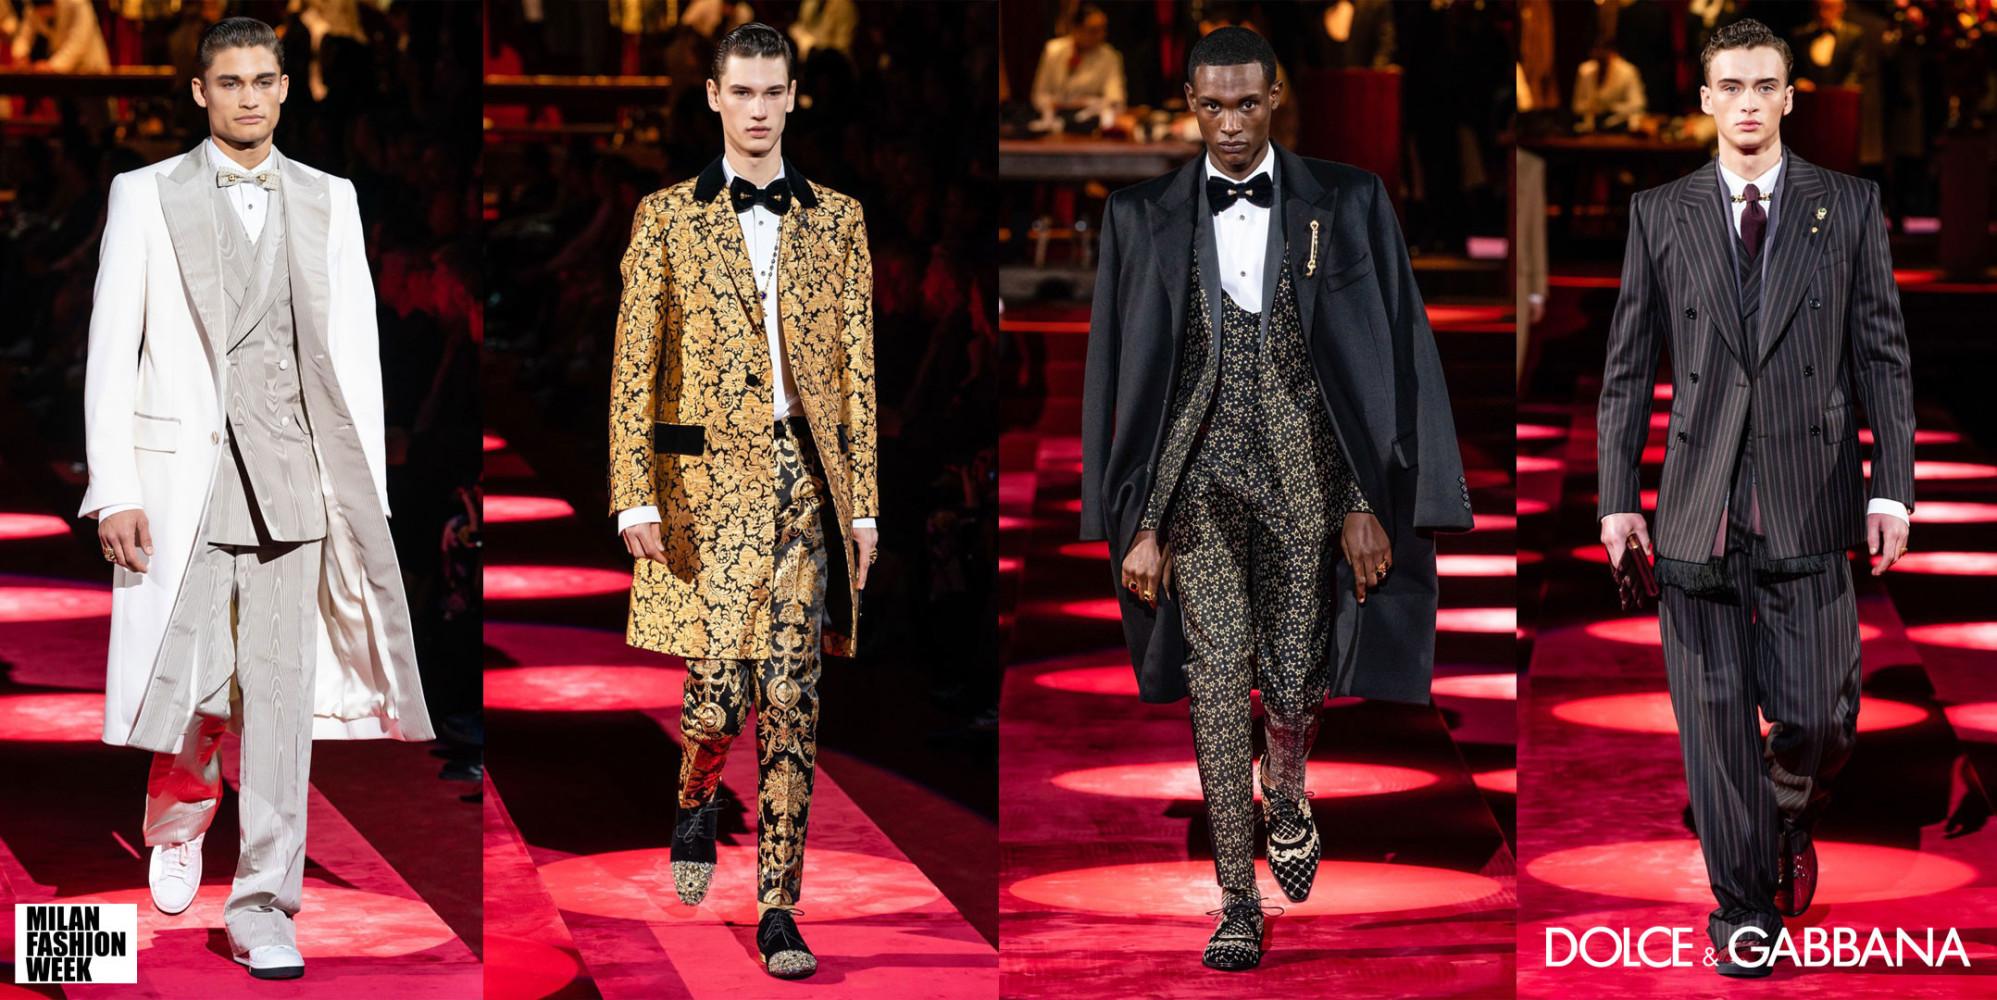 Dolce & Gabbana Menswear F/W'19 Runway Collection in Milan